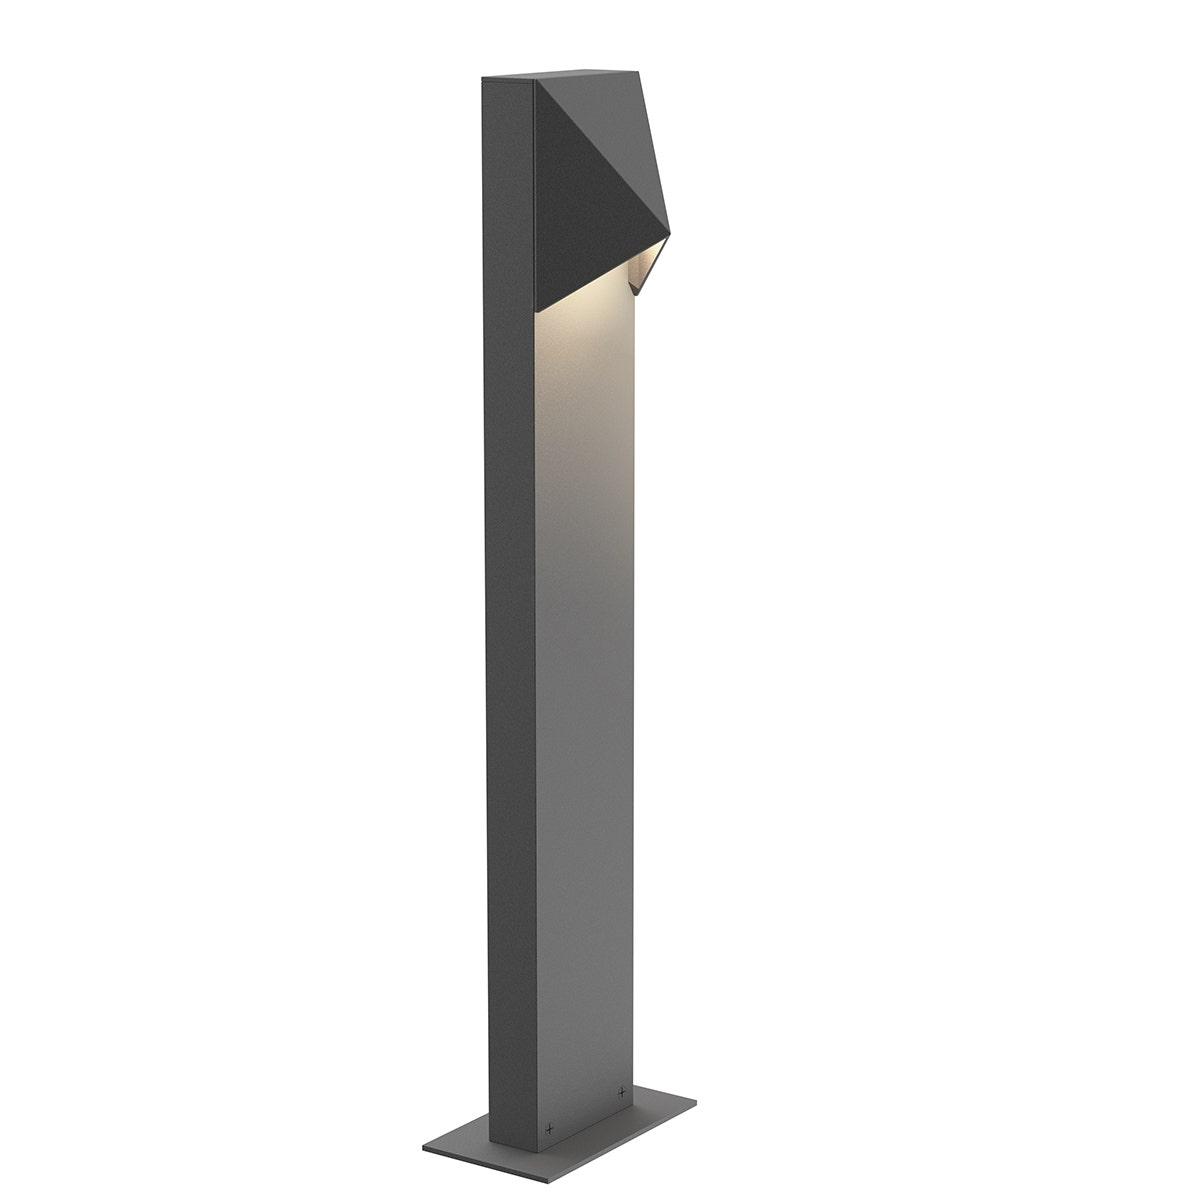 sonneman Triform Compact LED Bollard outdoor